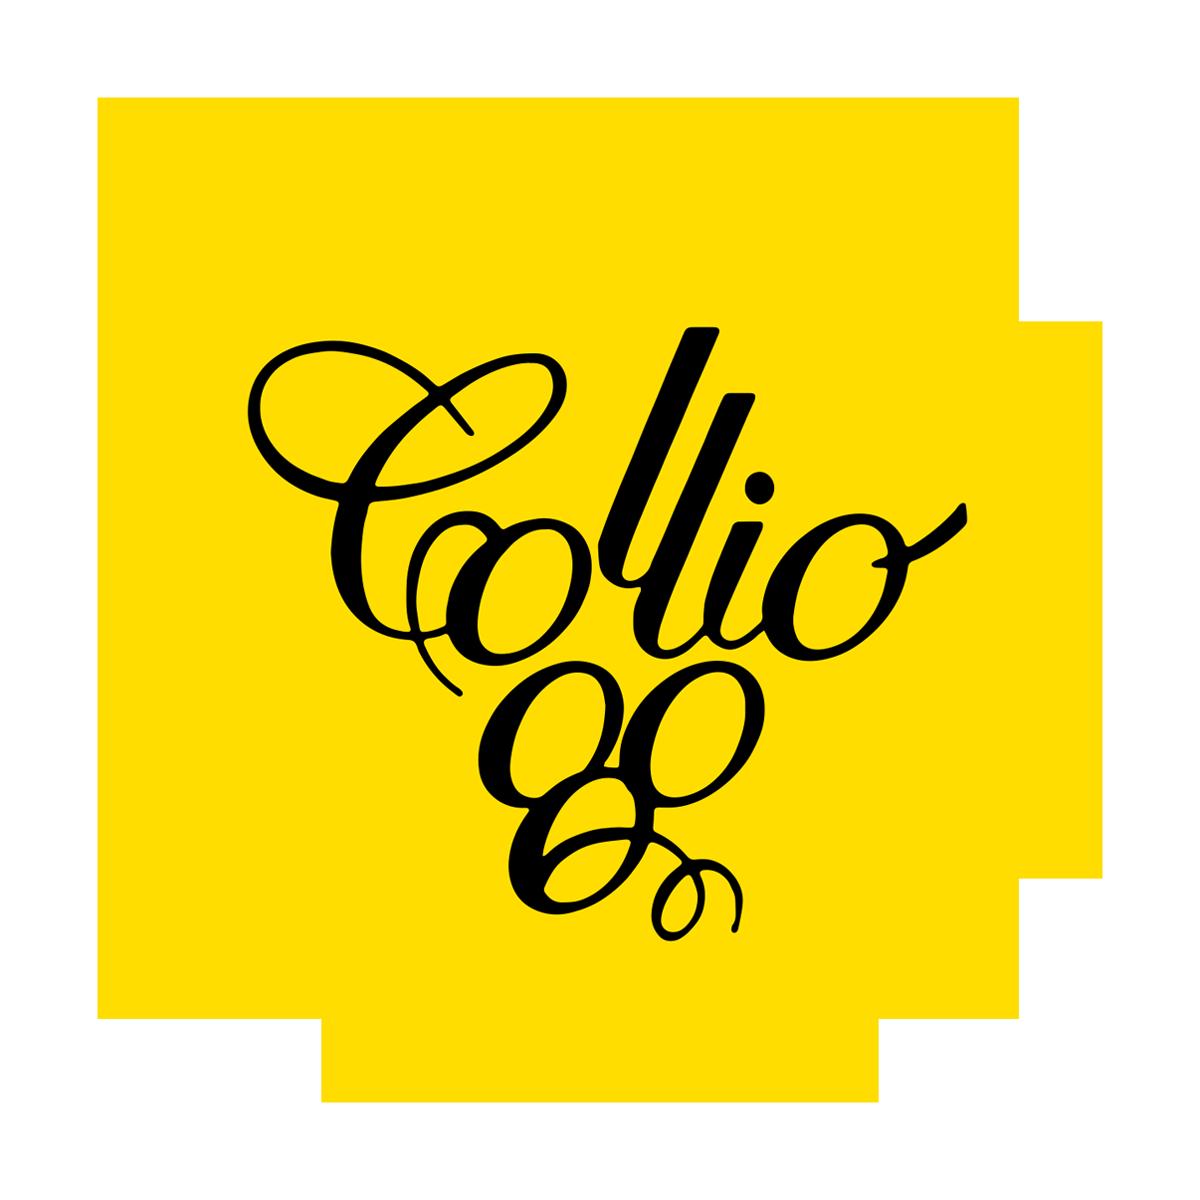 Enjoy Collio